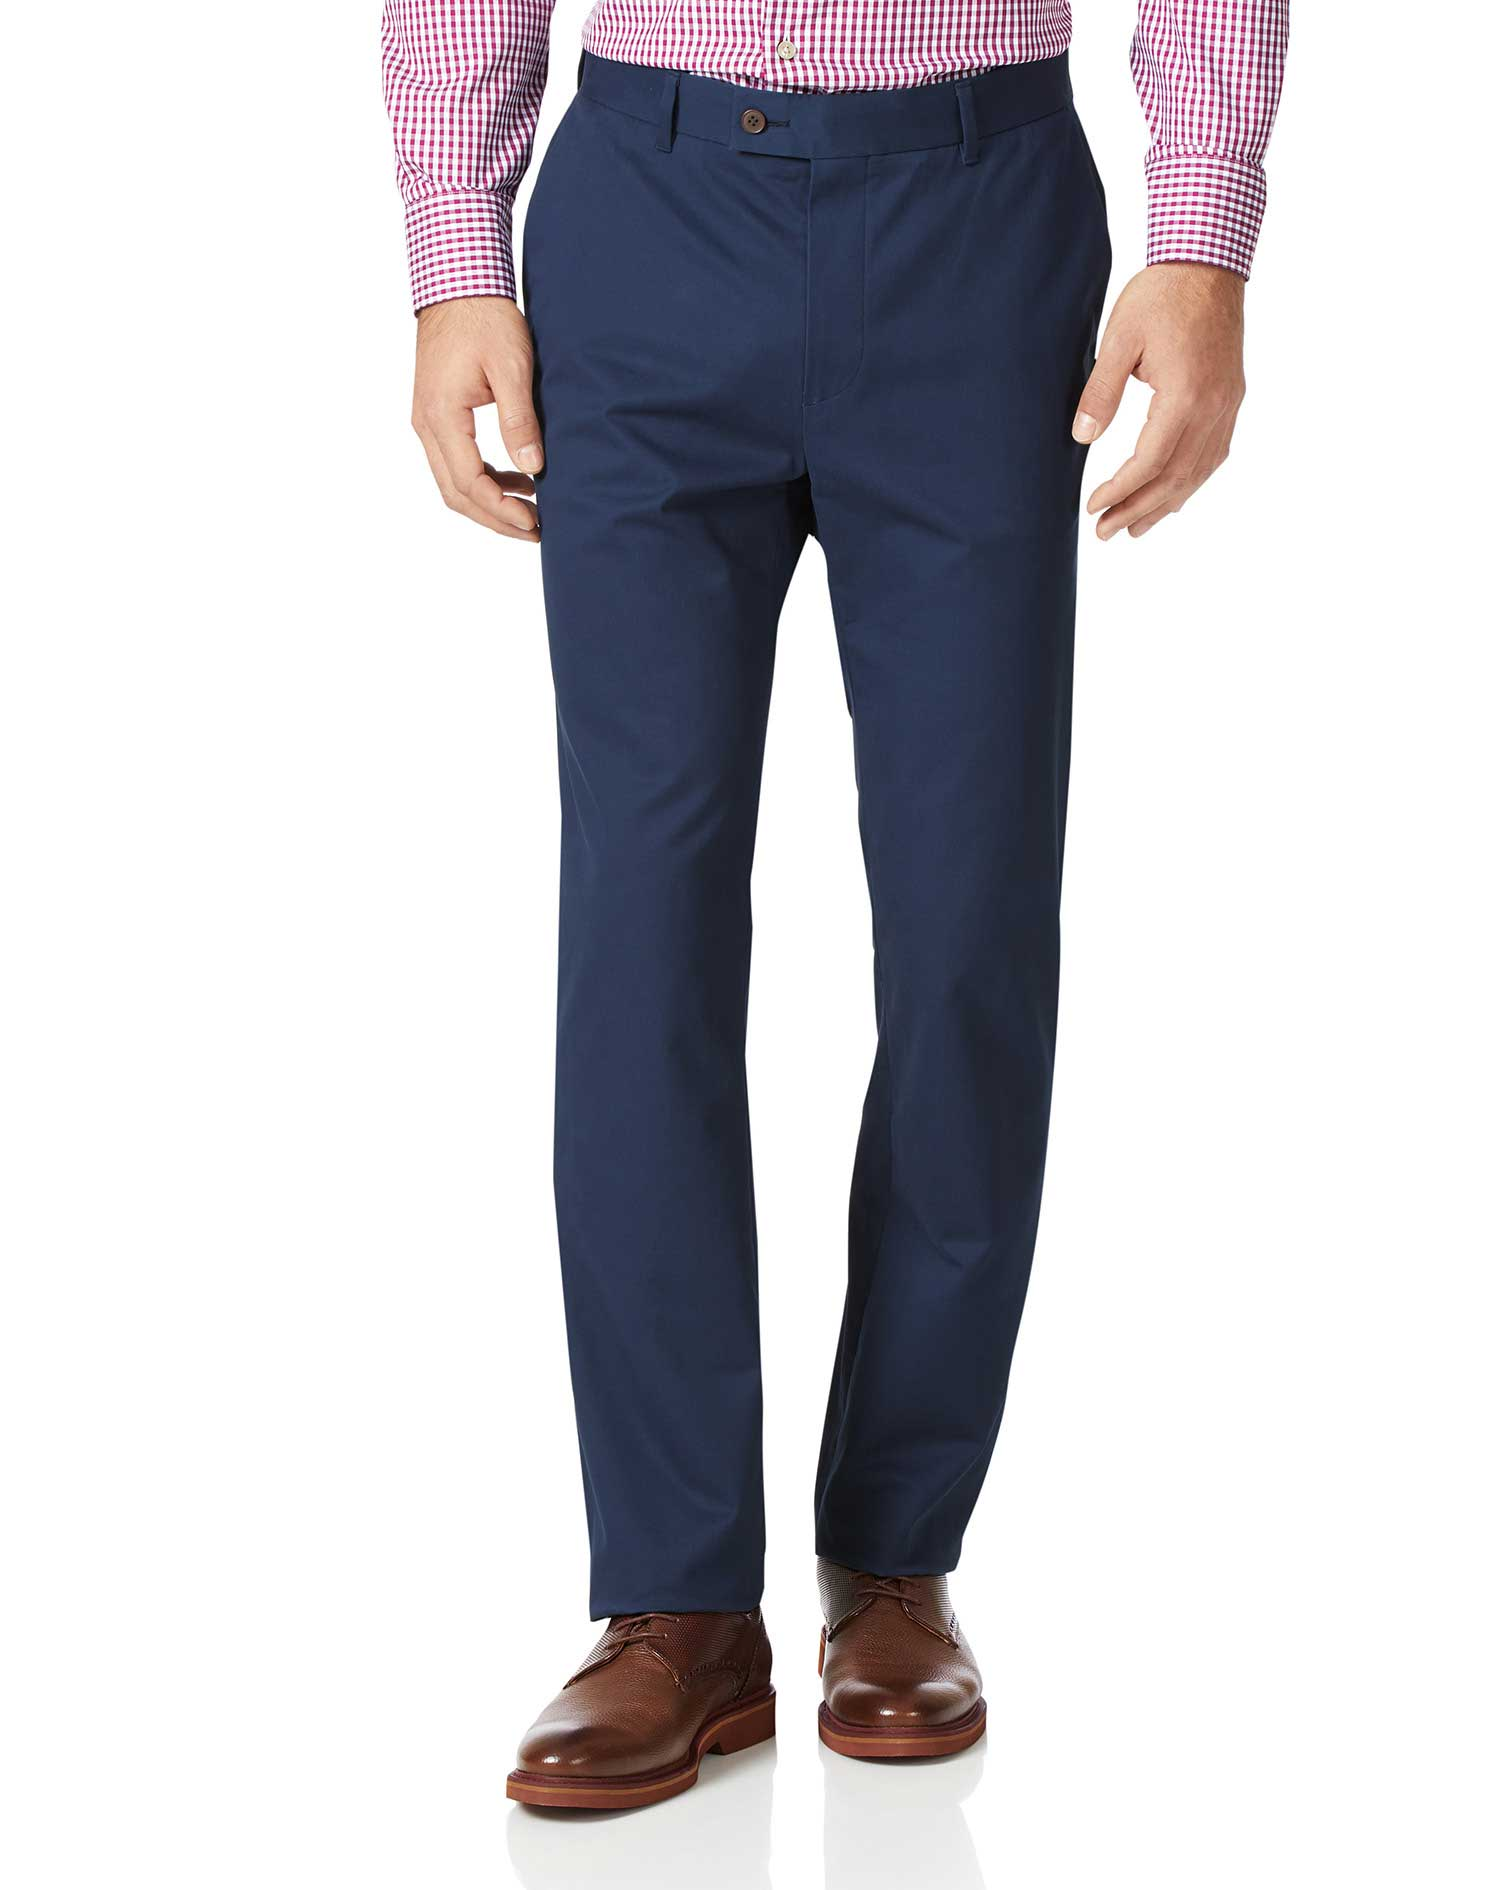 Dark Blue Slim Fit Stretch Cotton Chino Trousers Size W30 L30 by Charles Tyrwhitt